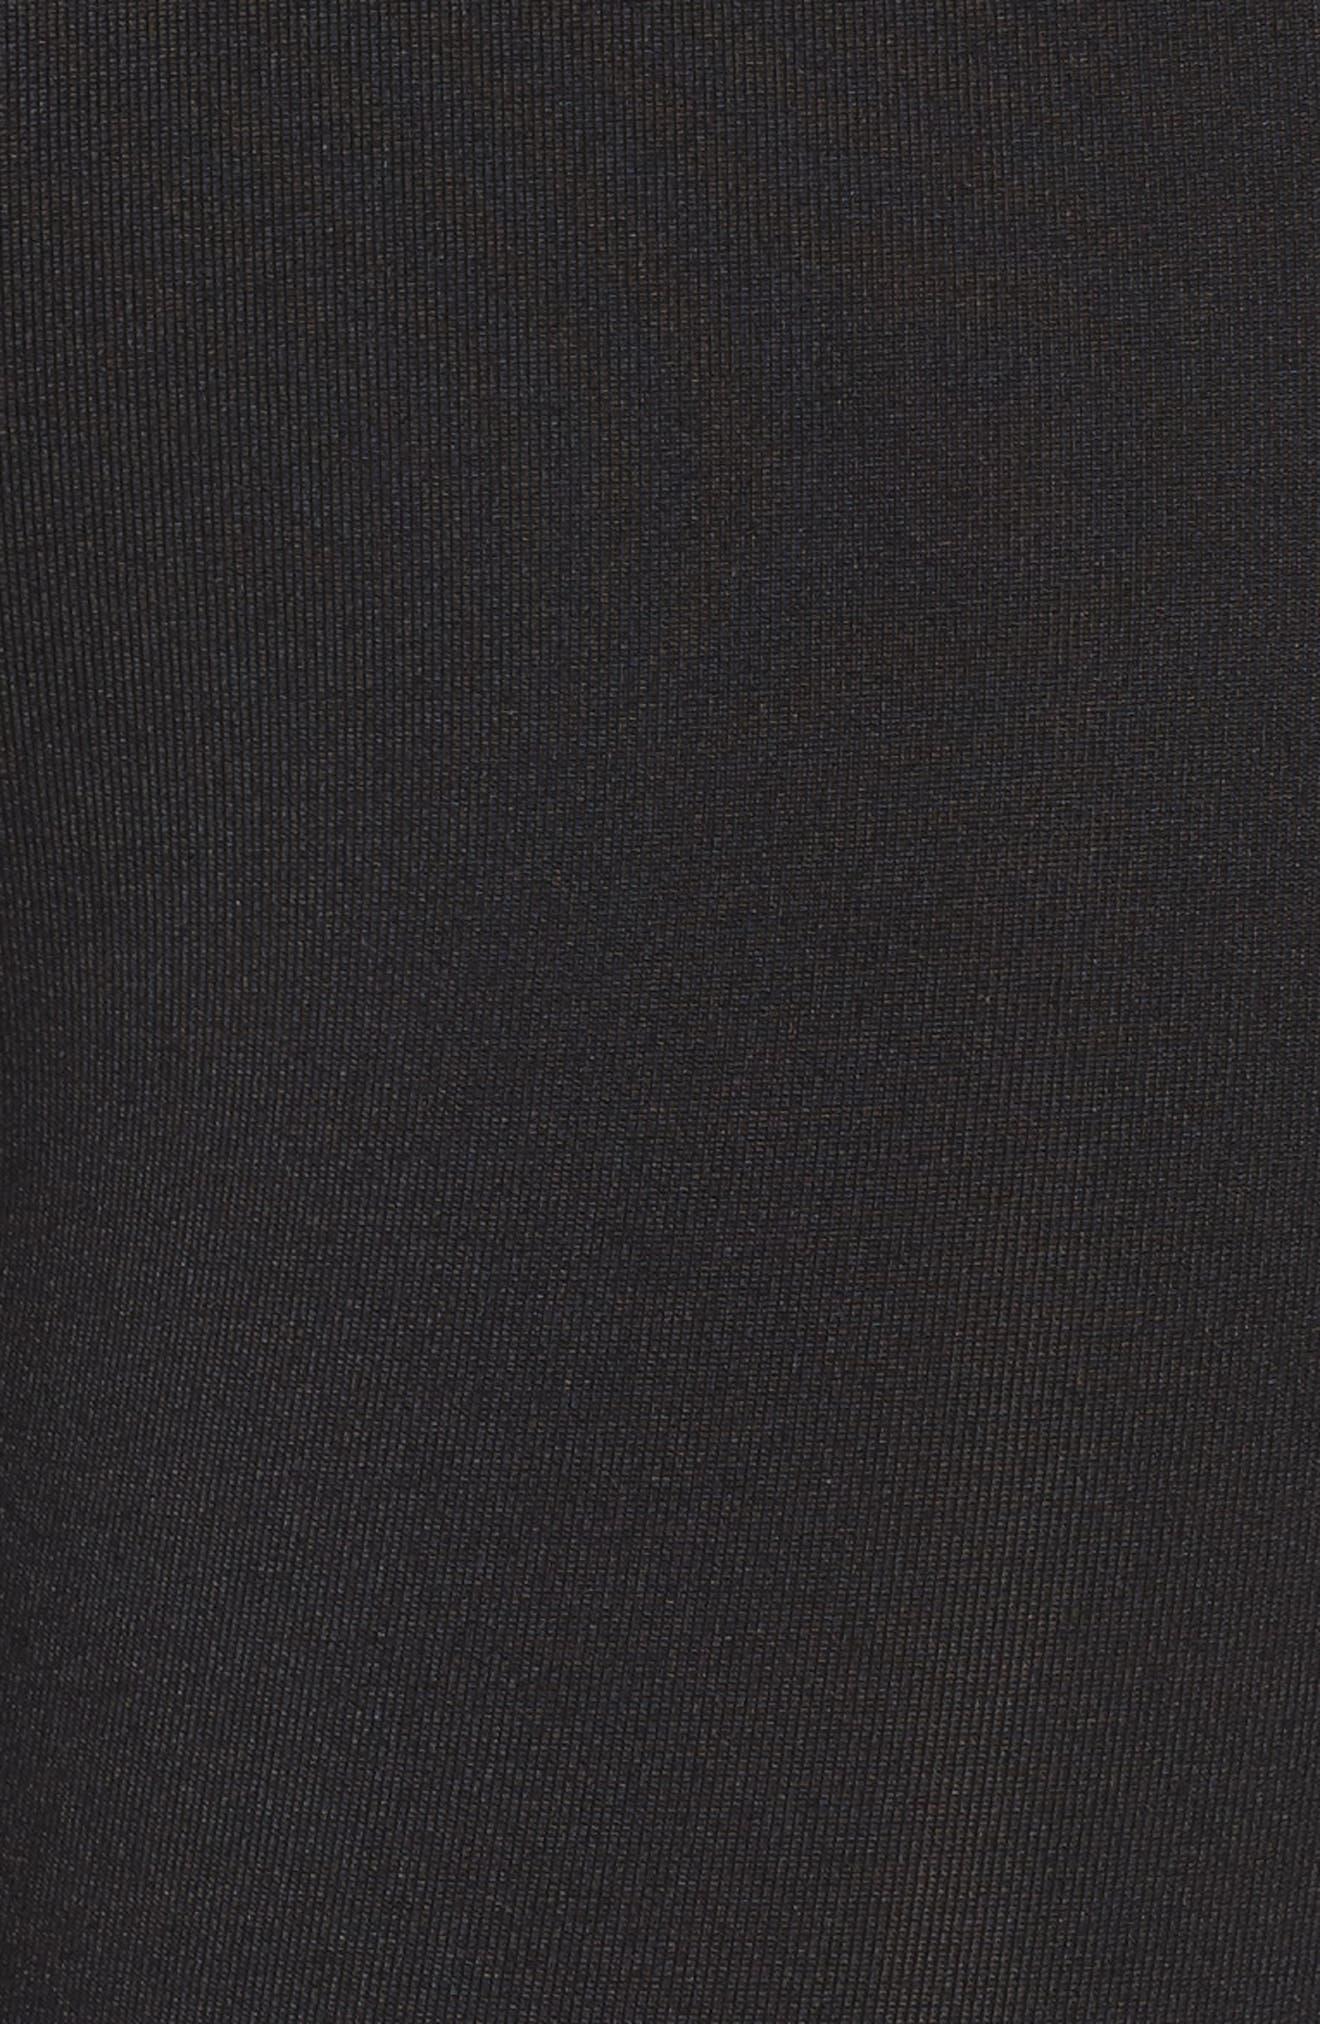 FP Movement Raku Reflective Leggings,                             Alternate thumbnail 5, color,                             001